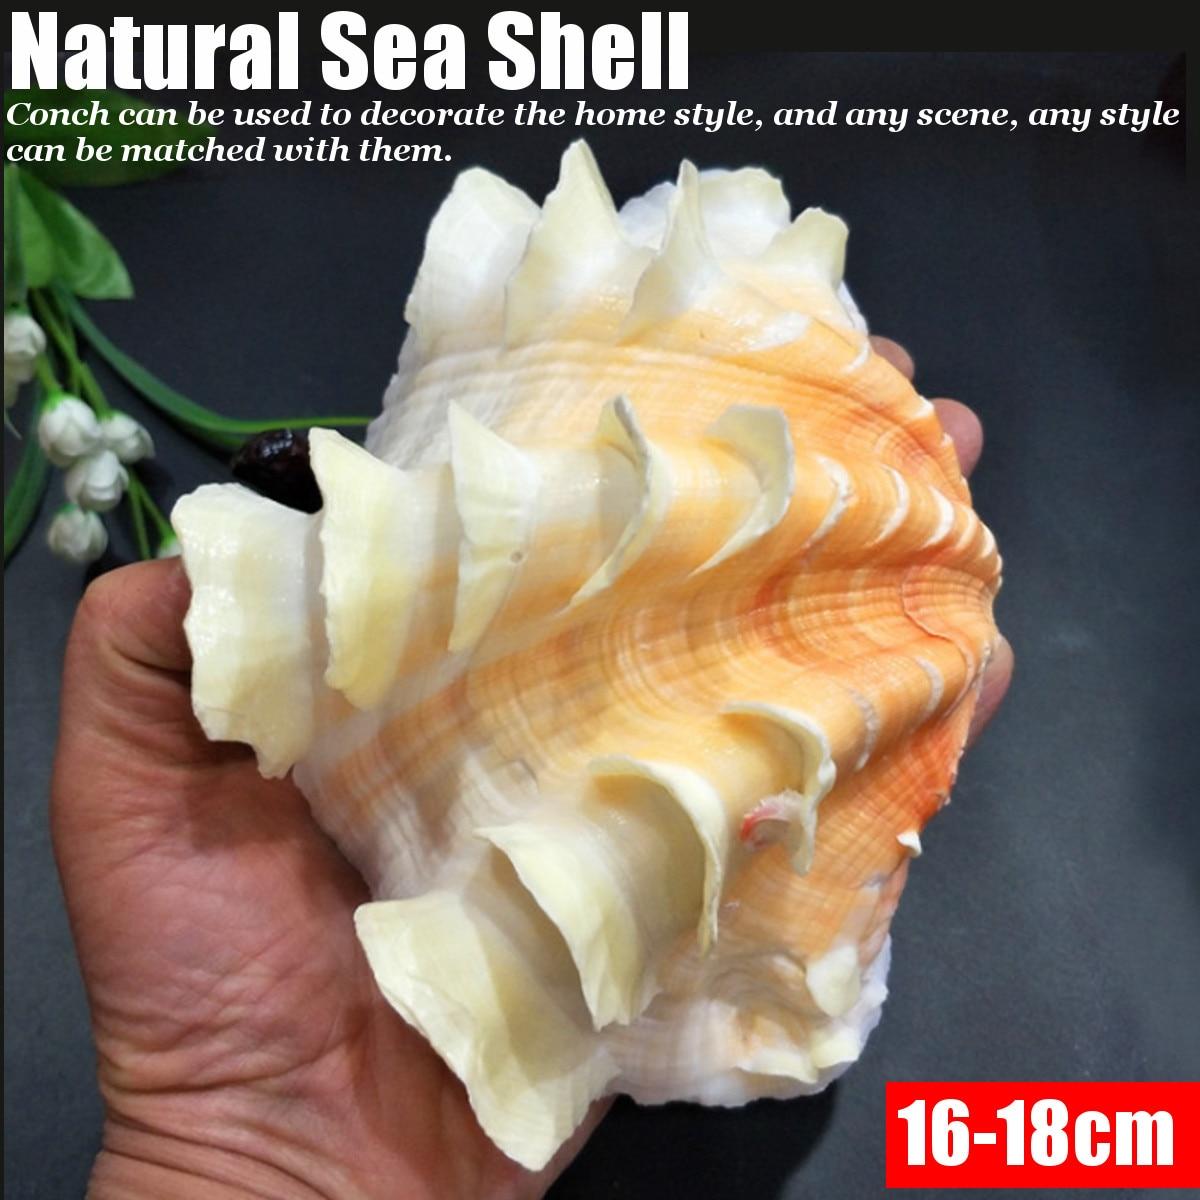 16-18cm Natural Sea Shell Conch Collectible Seashell Home Furnishing Marine Sea Decor Fish Tank Accessories Aquarium Decoration